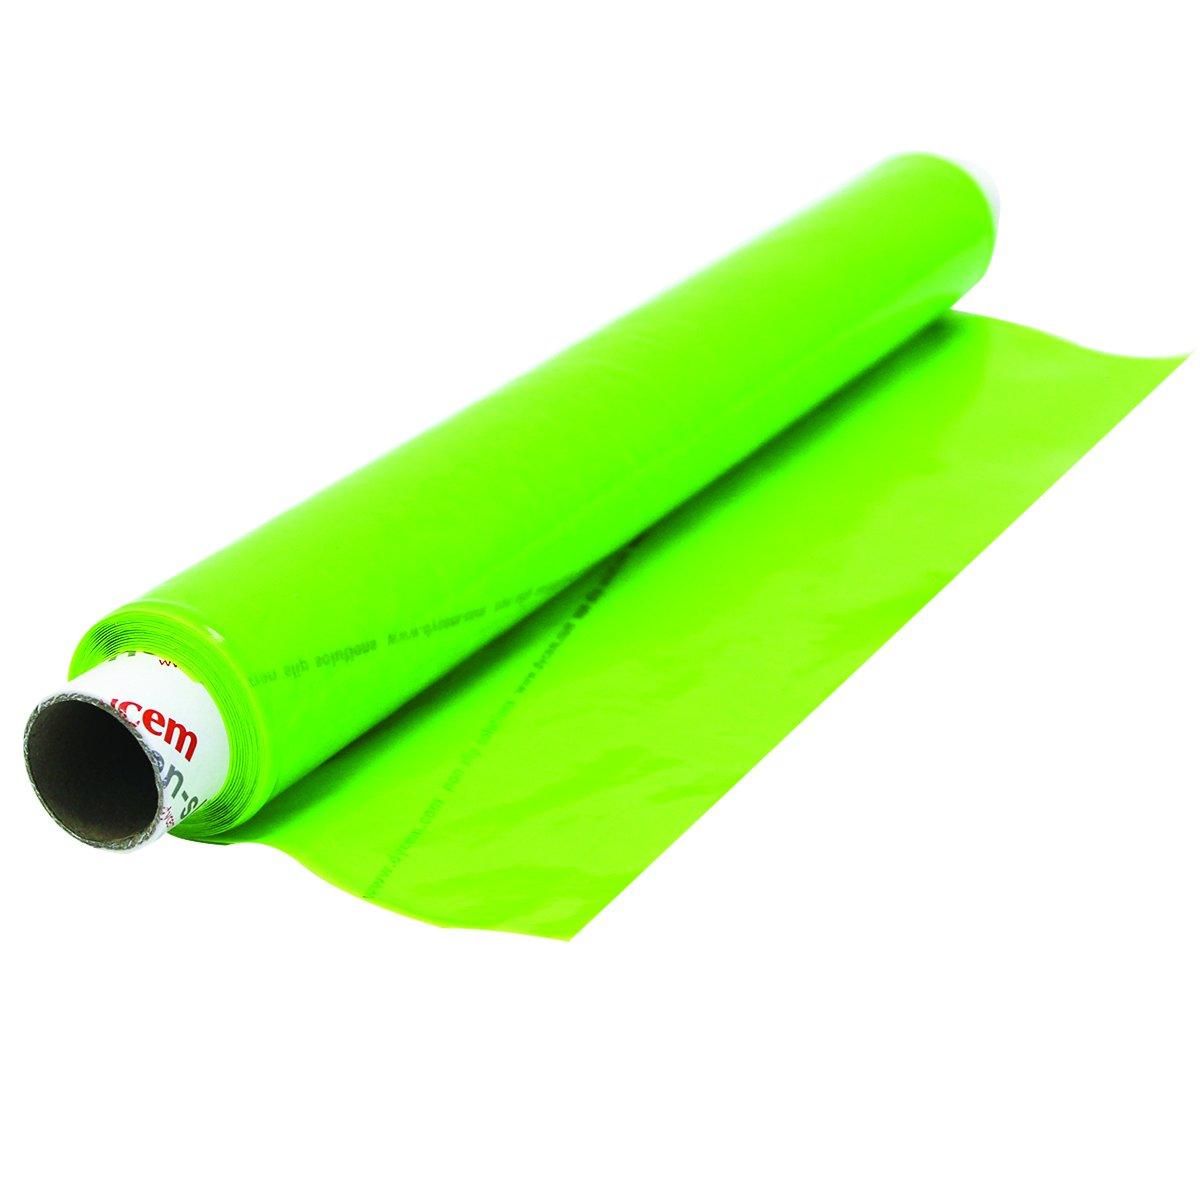 Dycem 50-1506LIM Non-Slip Material, Roll, 16 x 6-1/2', Lime 16 x 6-1/2' Dycem_